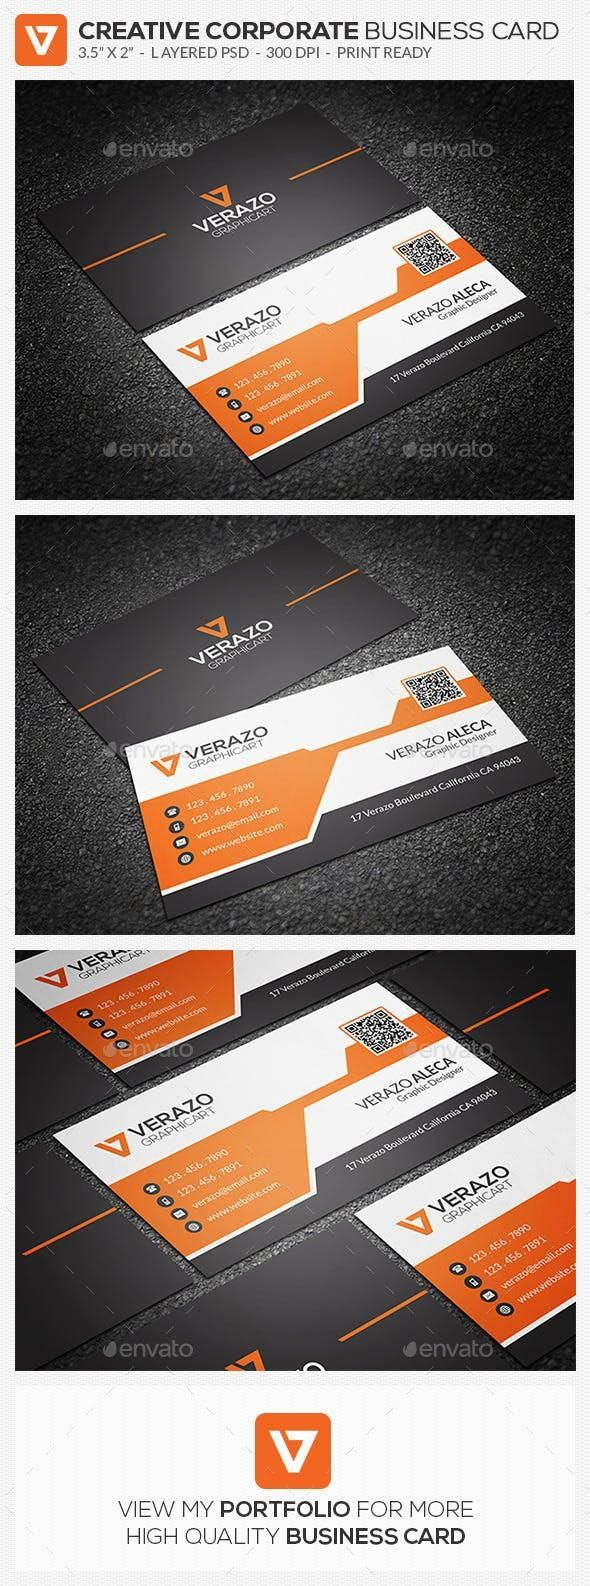 Creative Corporate Business Card 70 Business Cards Creative Business Card Design Simple Corporate Business Card